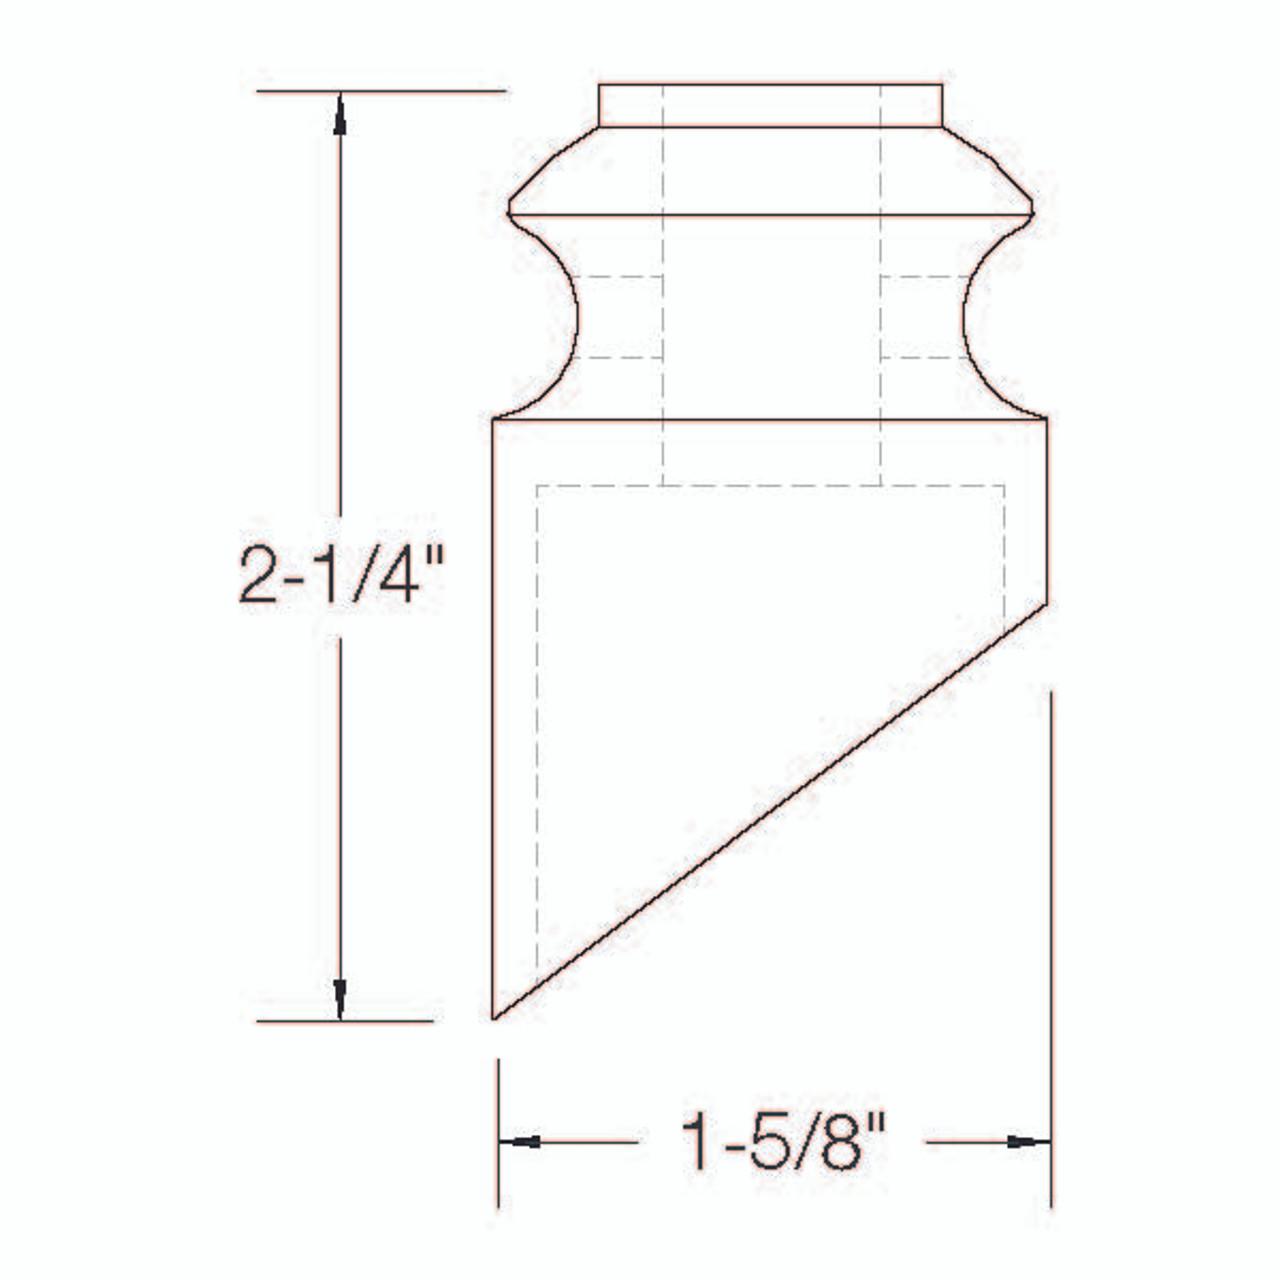 SHR904 12mm Slanted Light Shoe with Set Screw